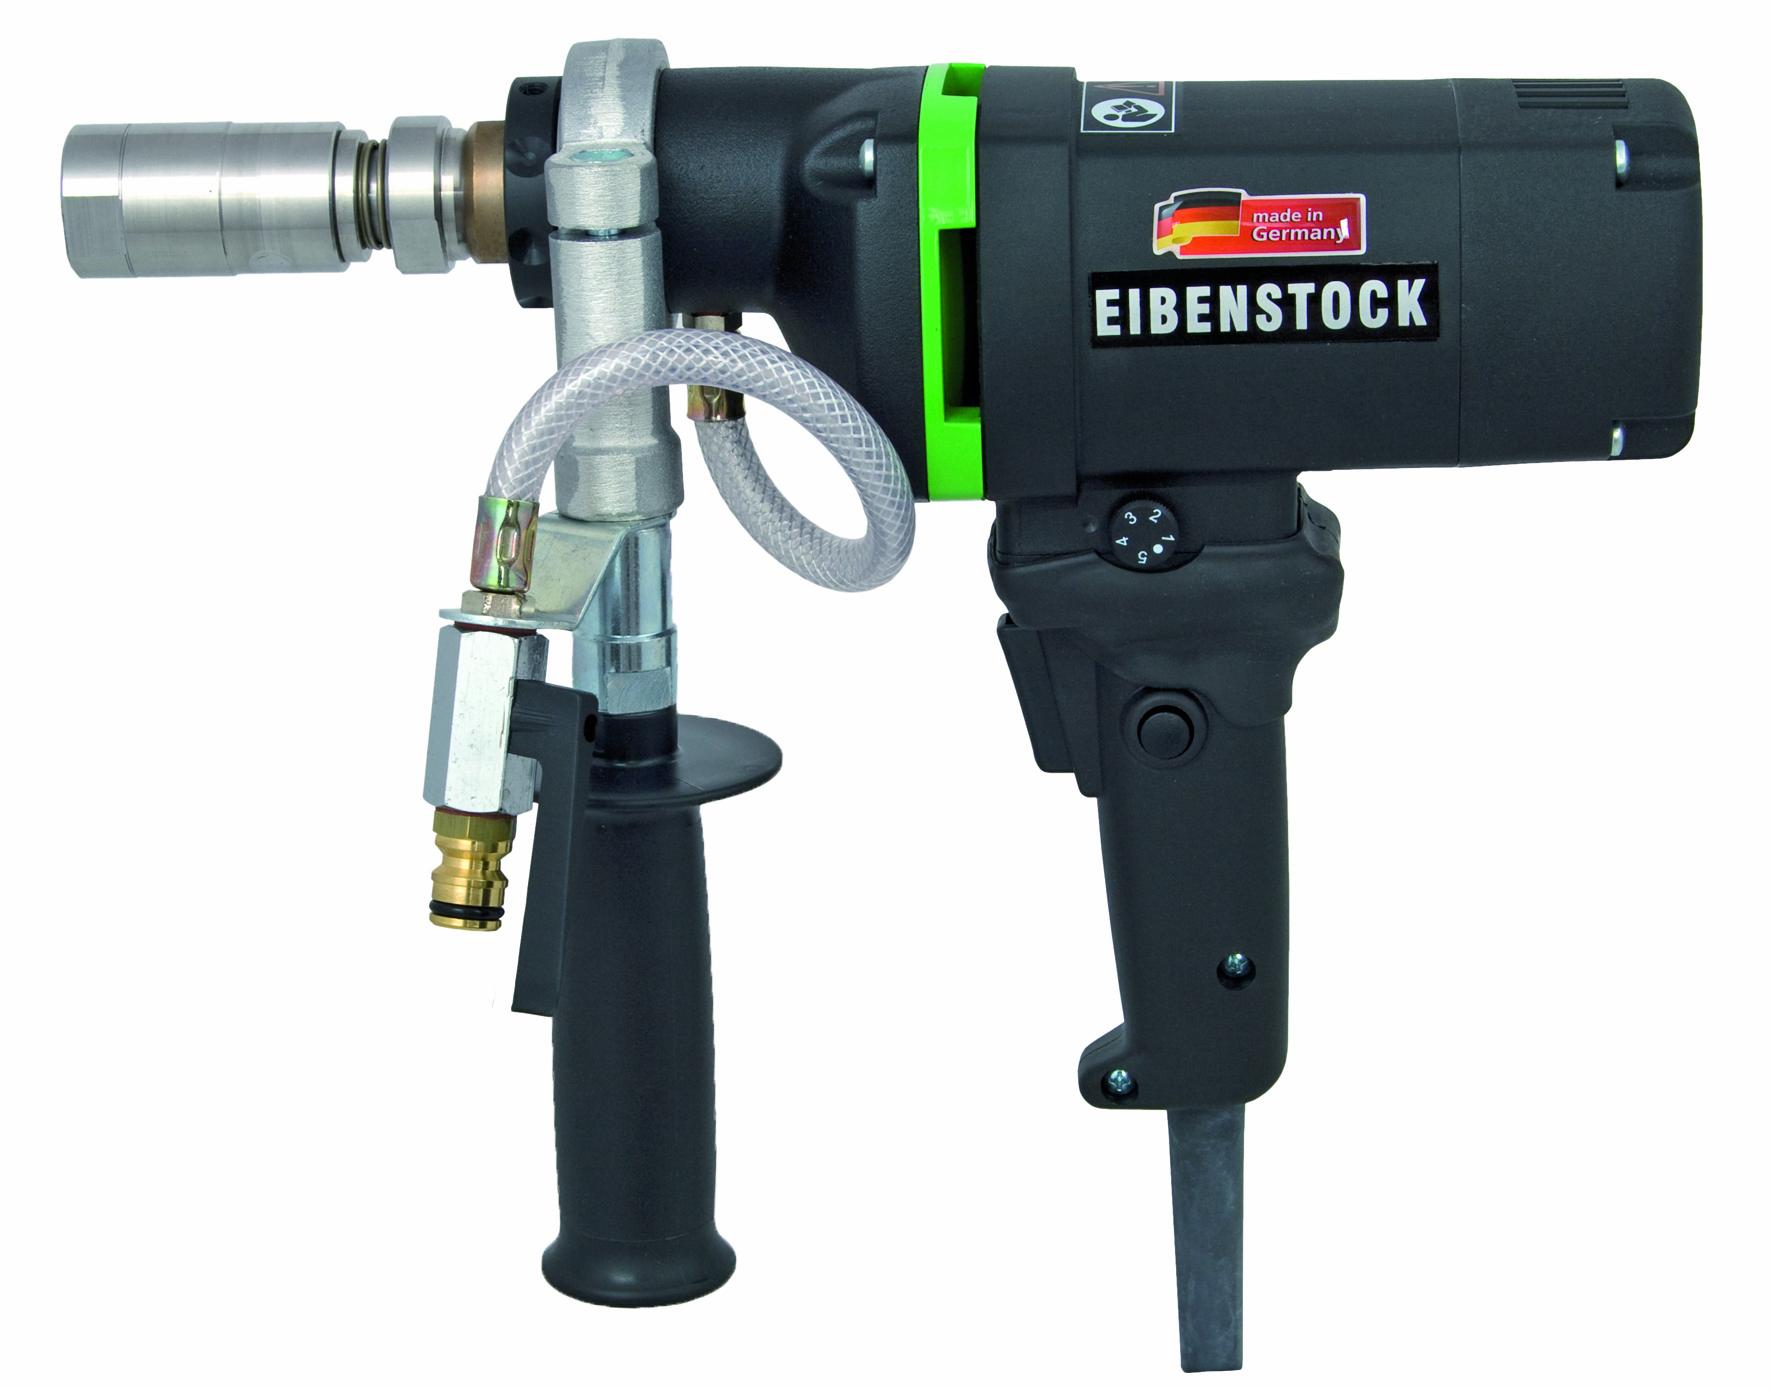 EIBENSTOCK Diamant-Bohrmaschine END 1550 P